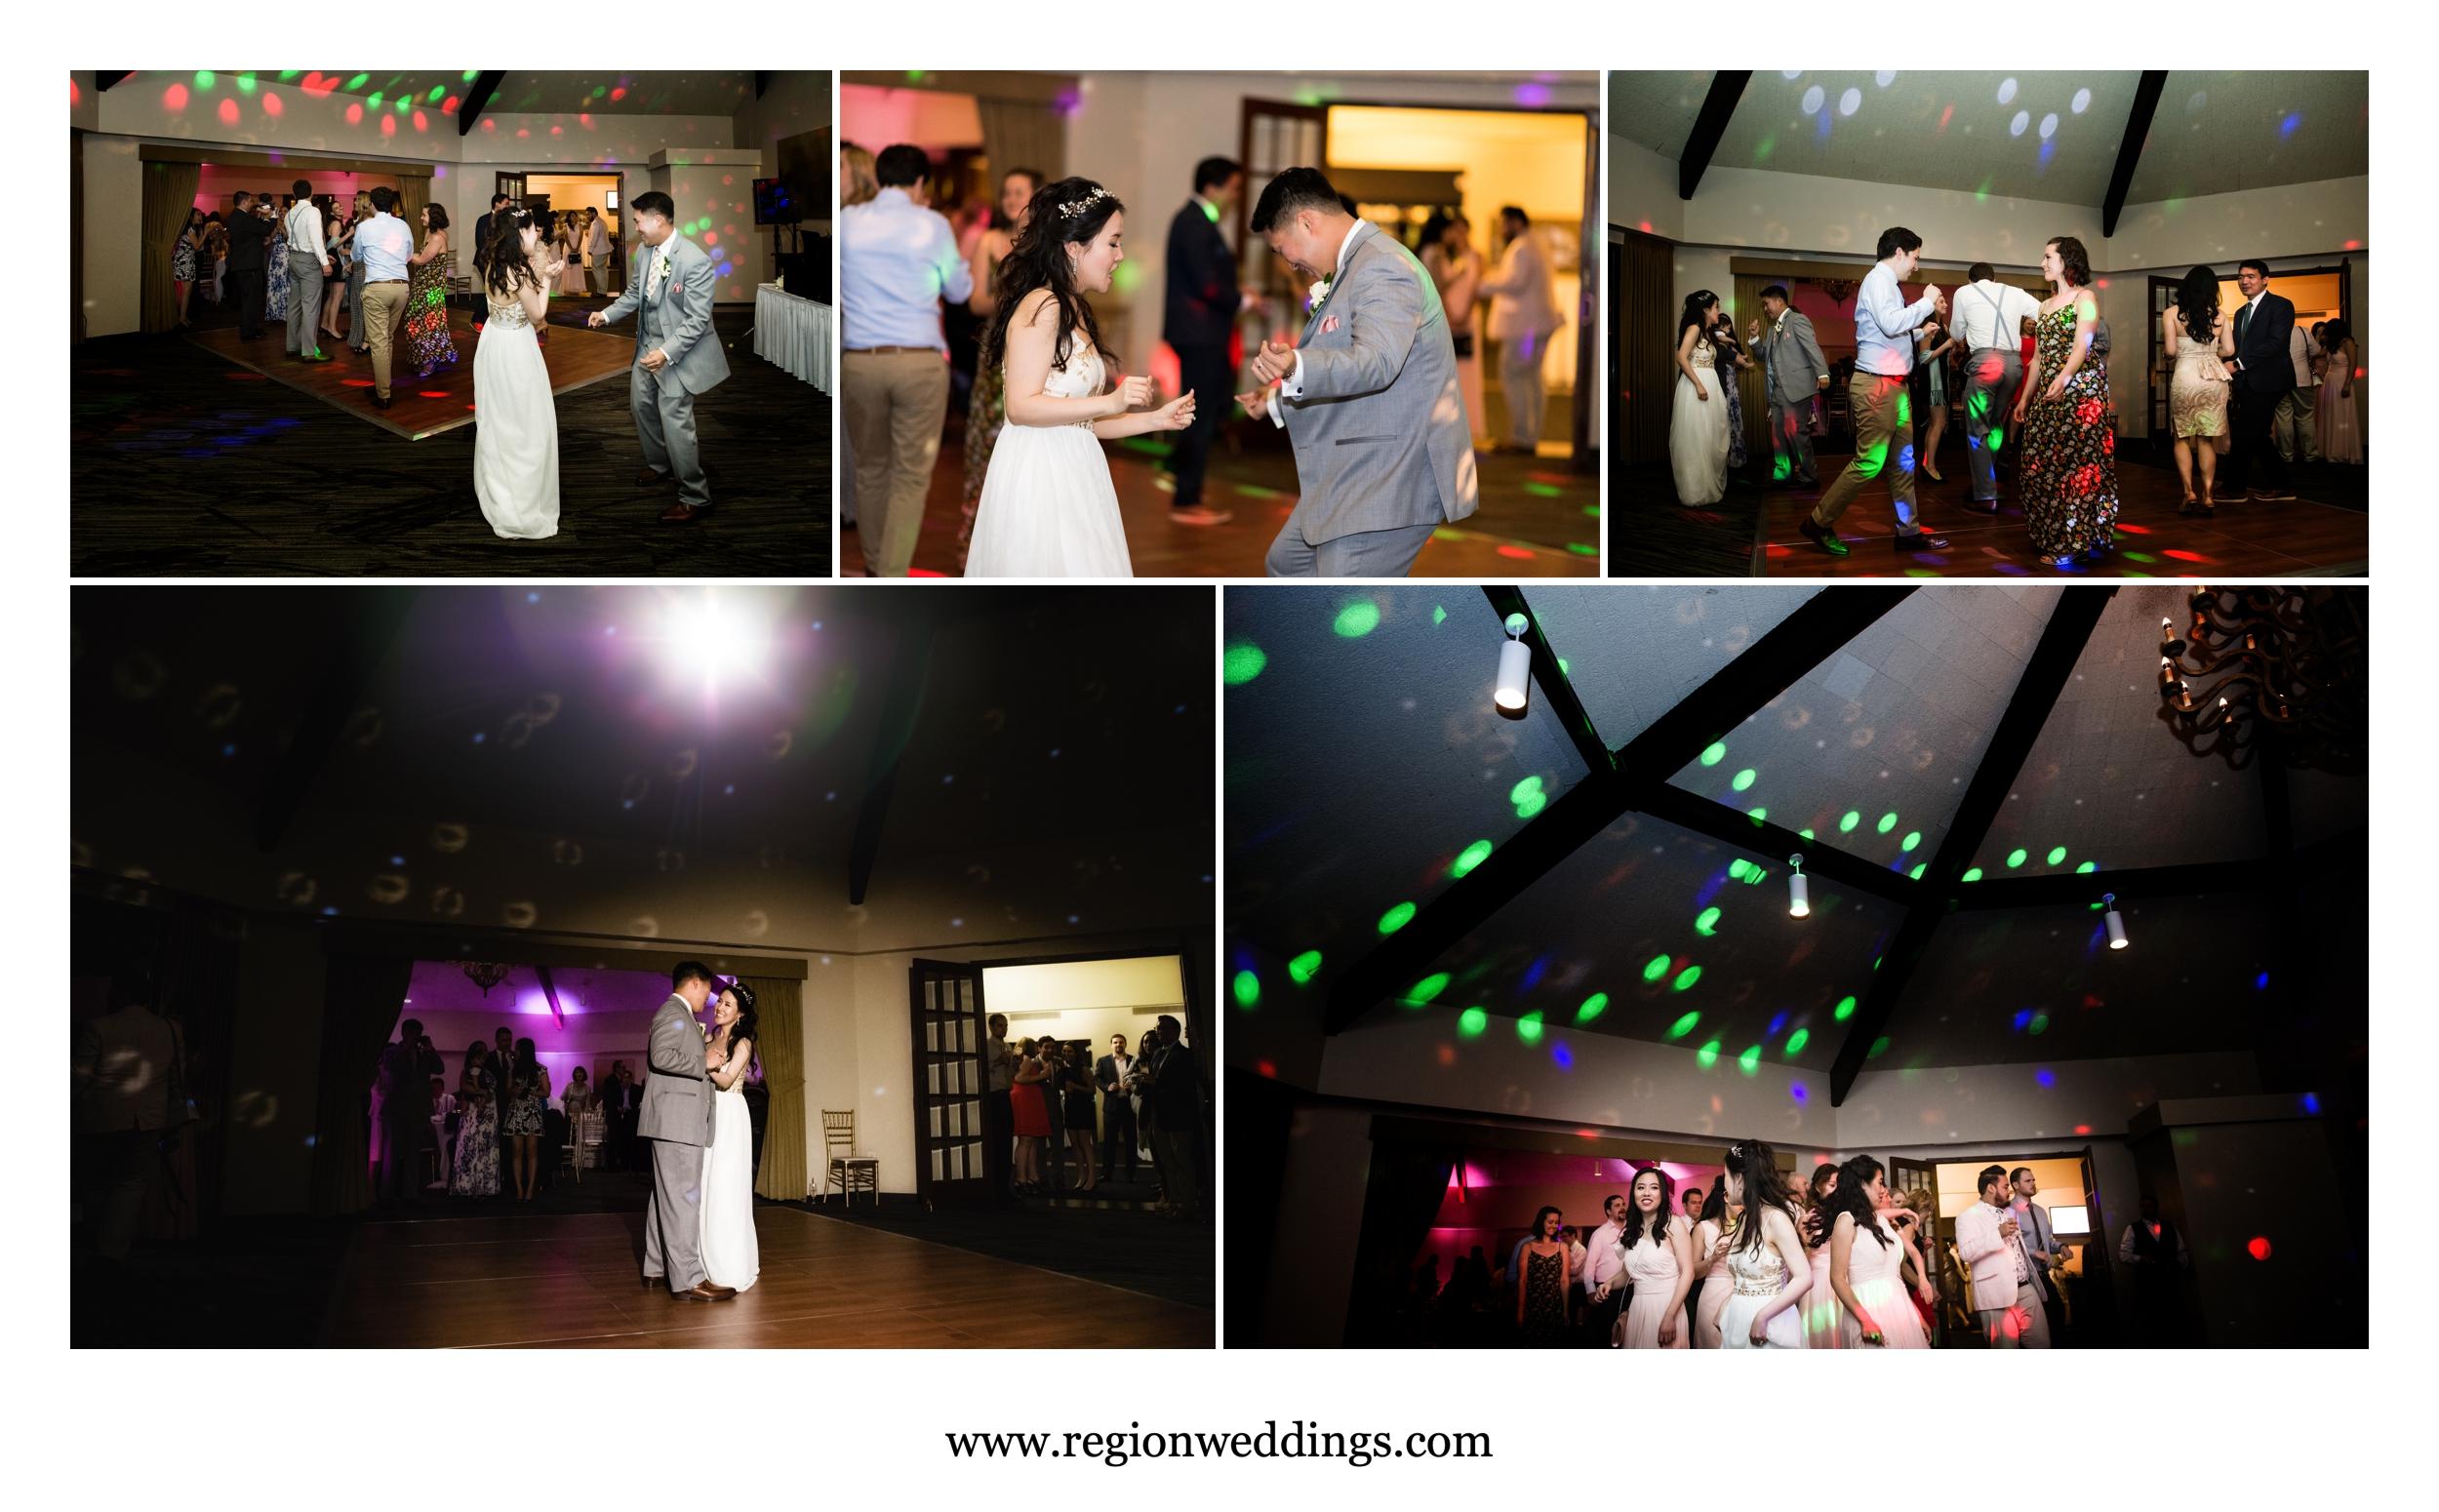 Wedding reception fun at Briar Ridge Country Club.